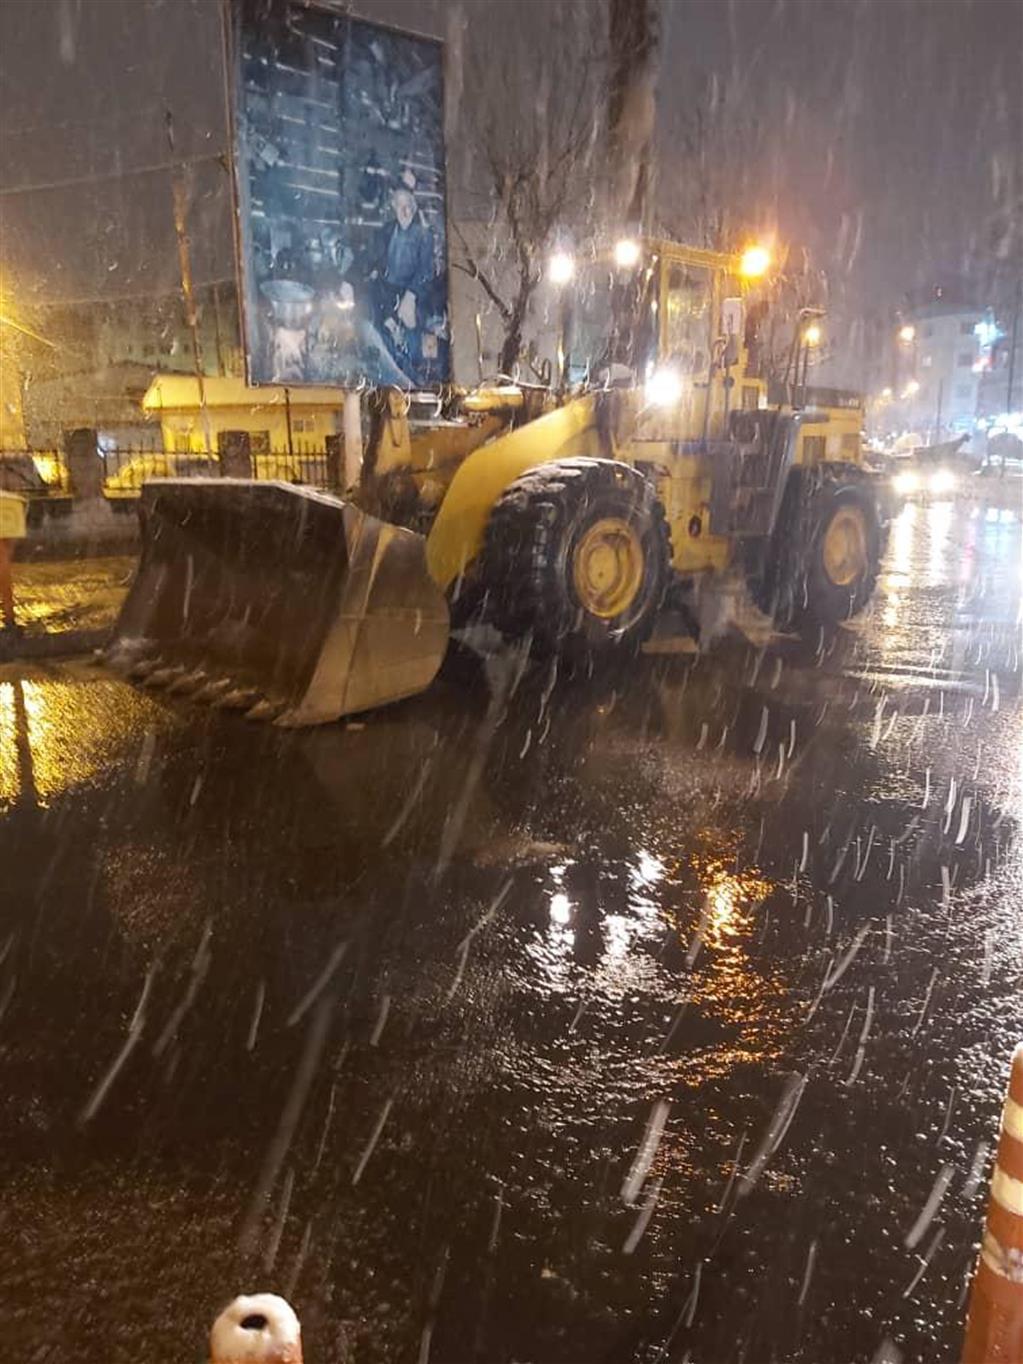 index - استقرار ماشینآلات شهرداری رشت در نقاط مختلف شهر در دقایق اولیه بارش برف